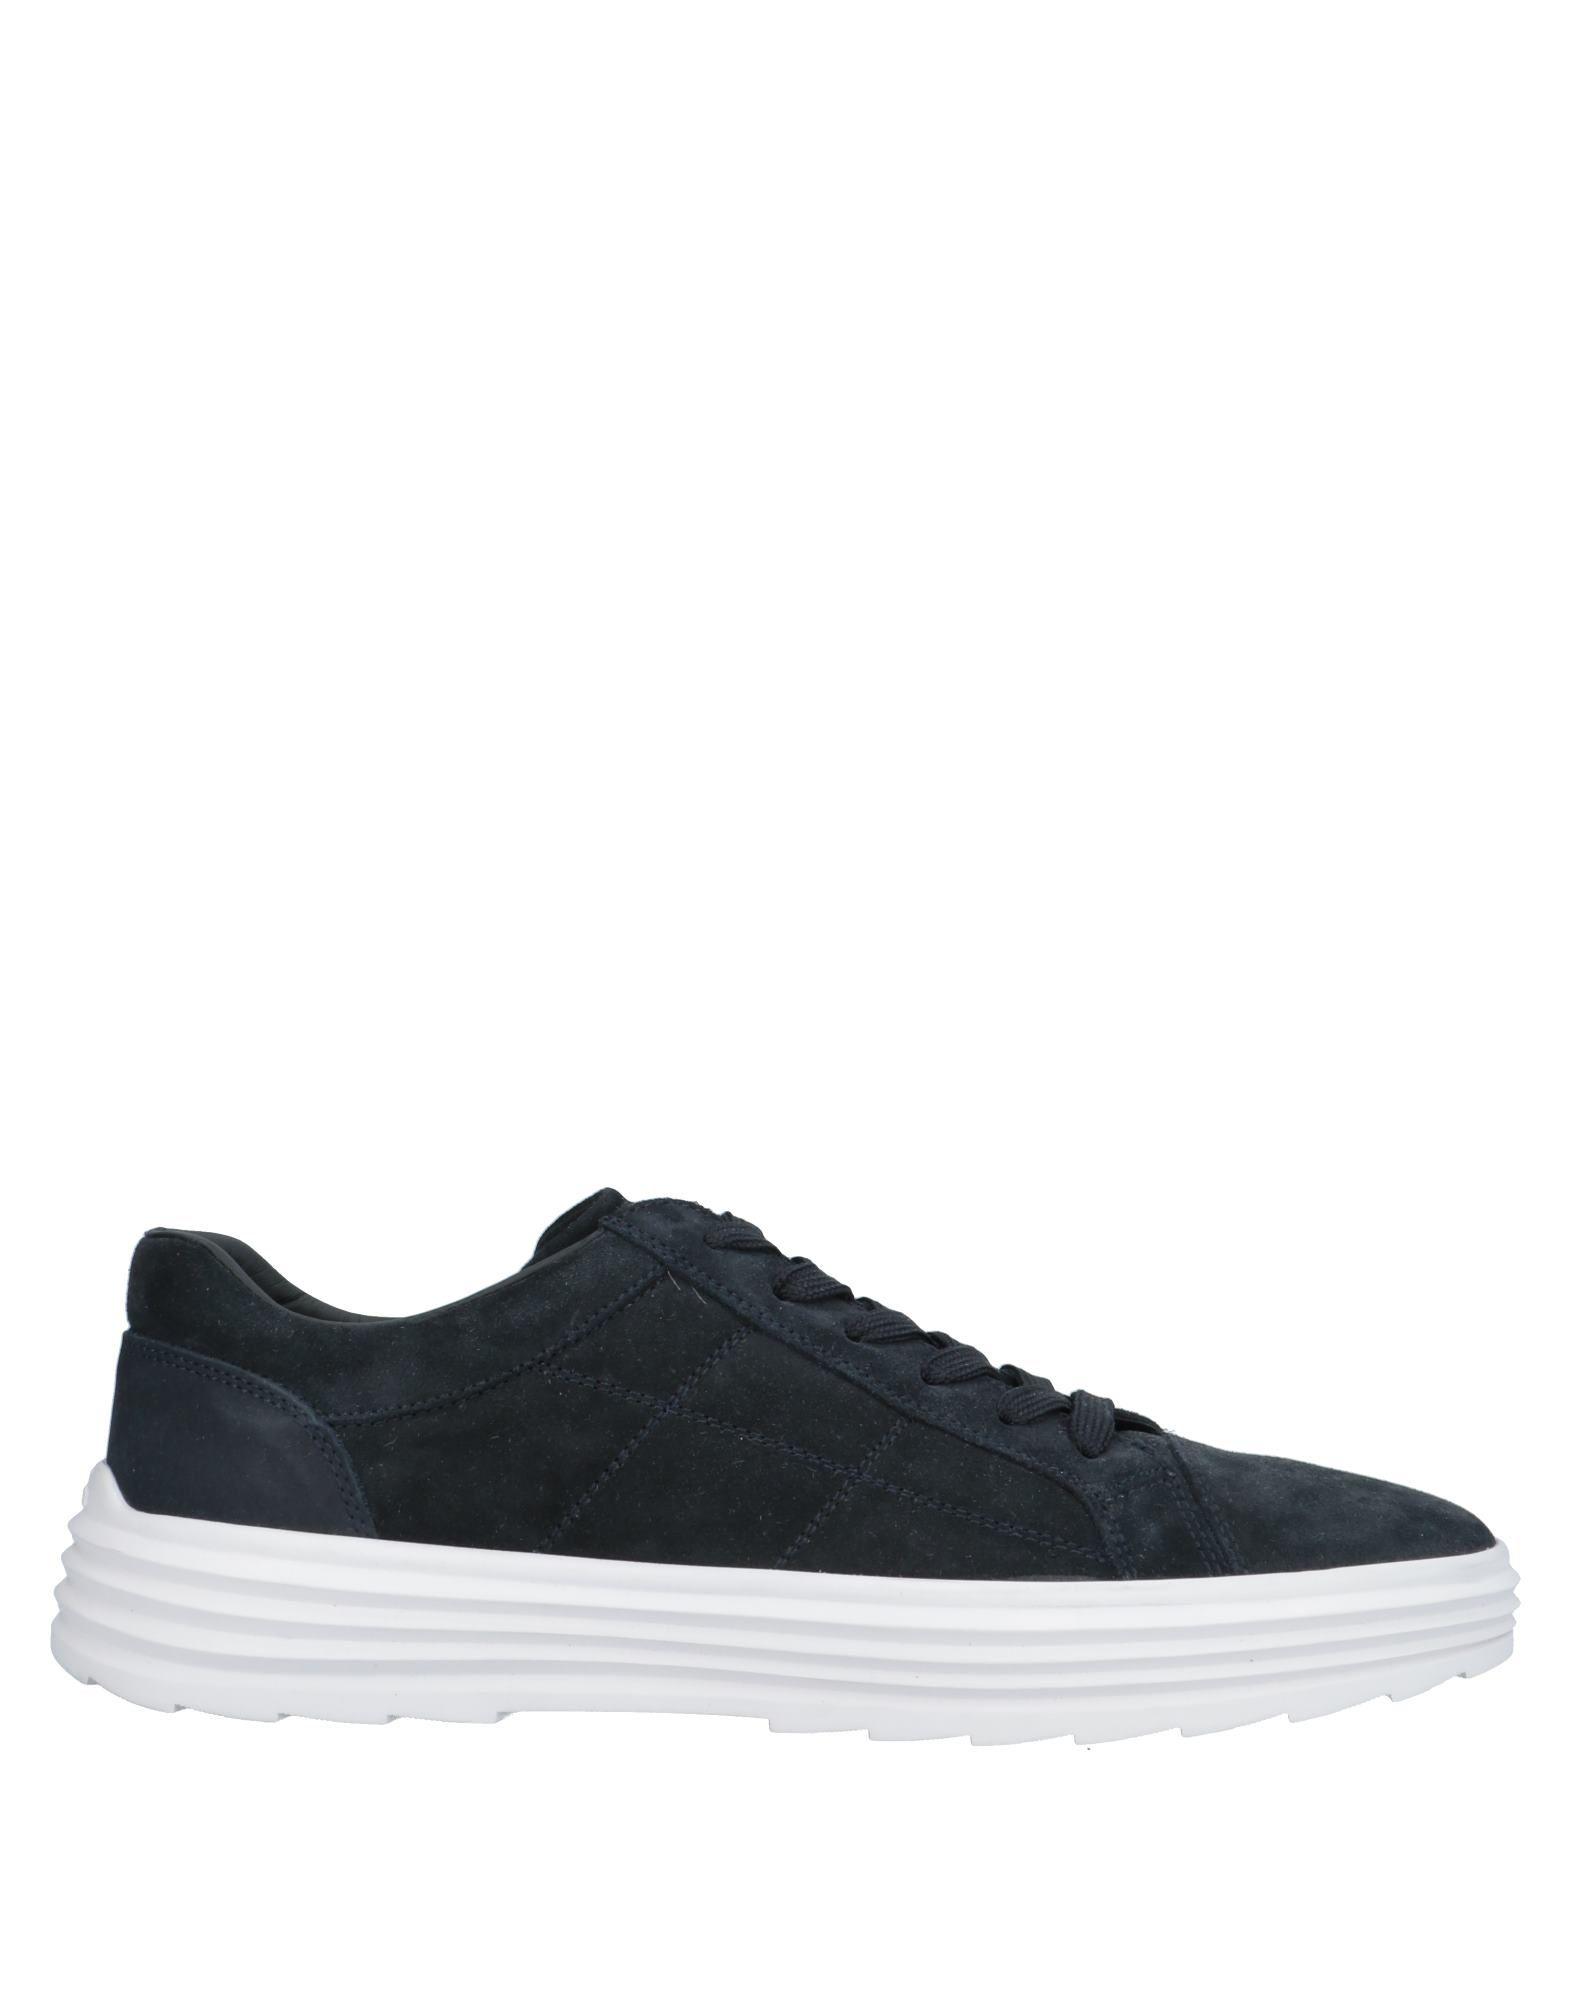 Hogan Sneakers Herren  11559768DB Gute Qualität beliebte Schuhe